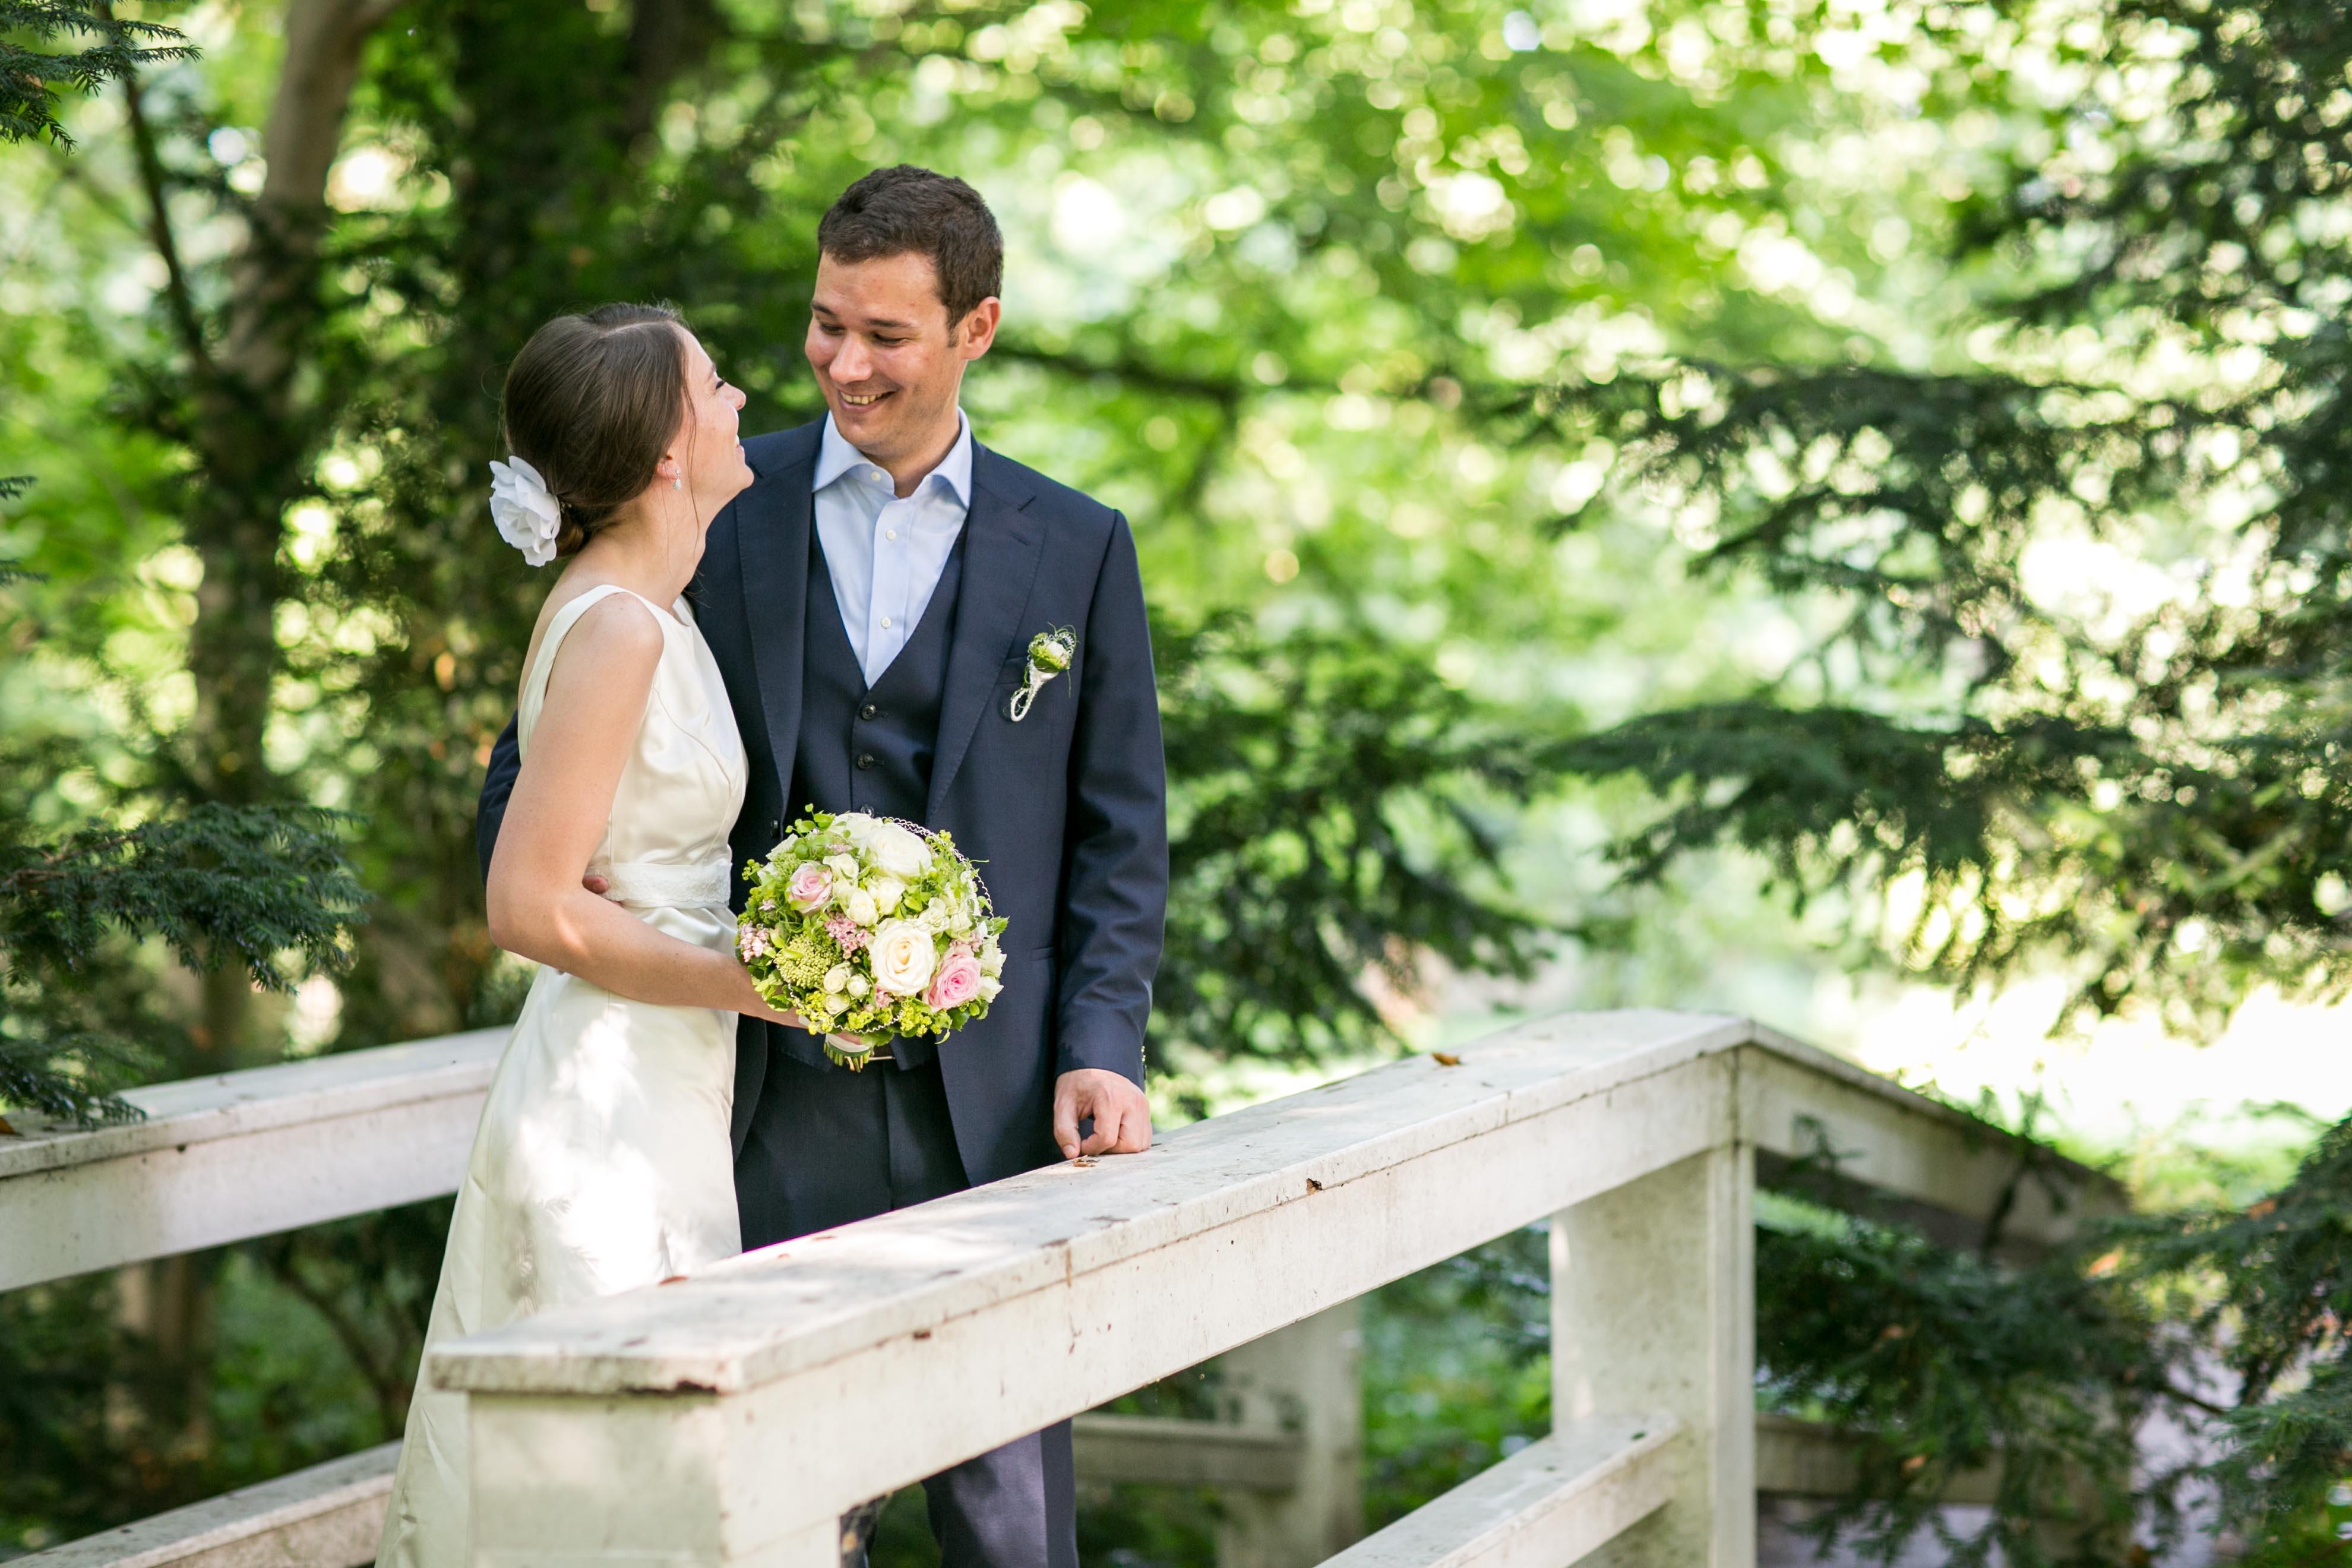 Fran Burrows Hochzeitsfotografie_shopandmarry.de-25